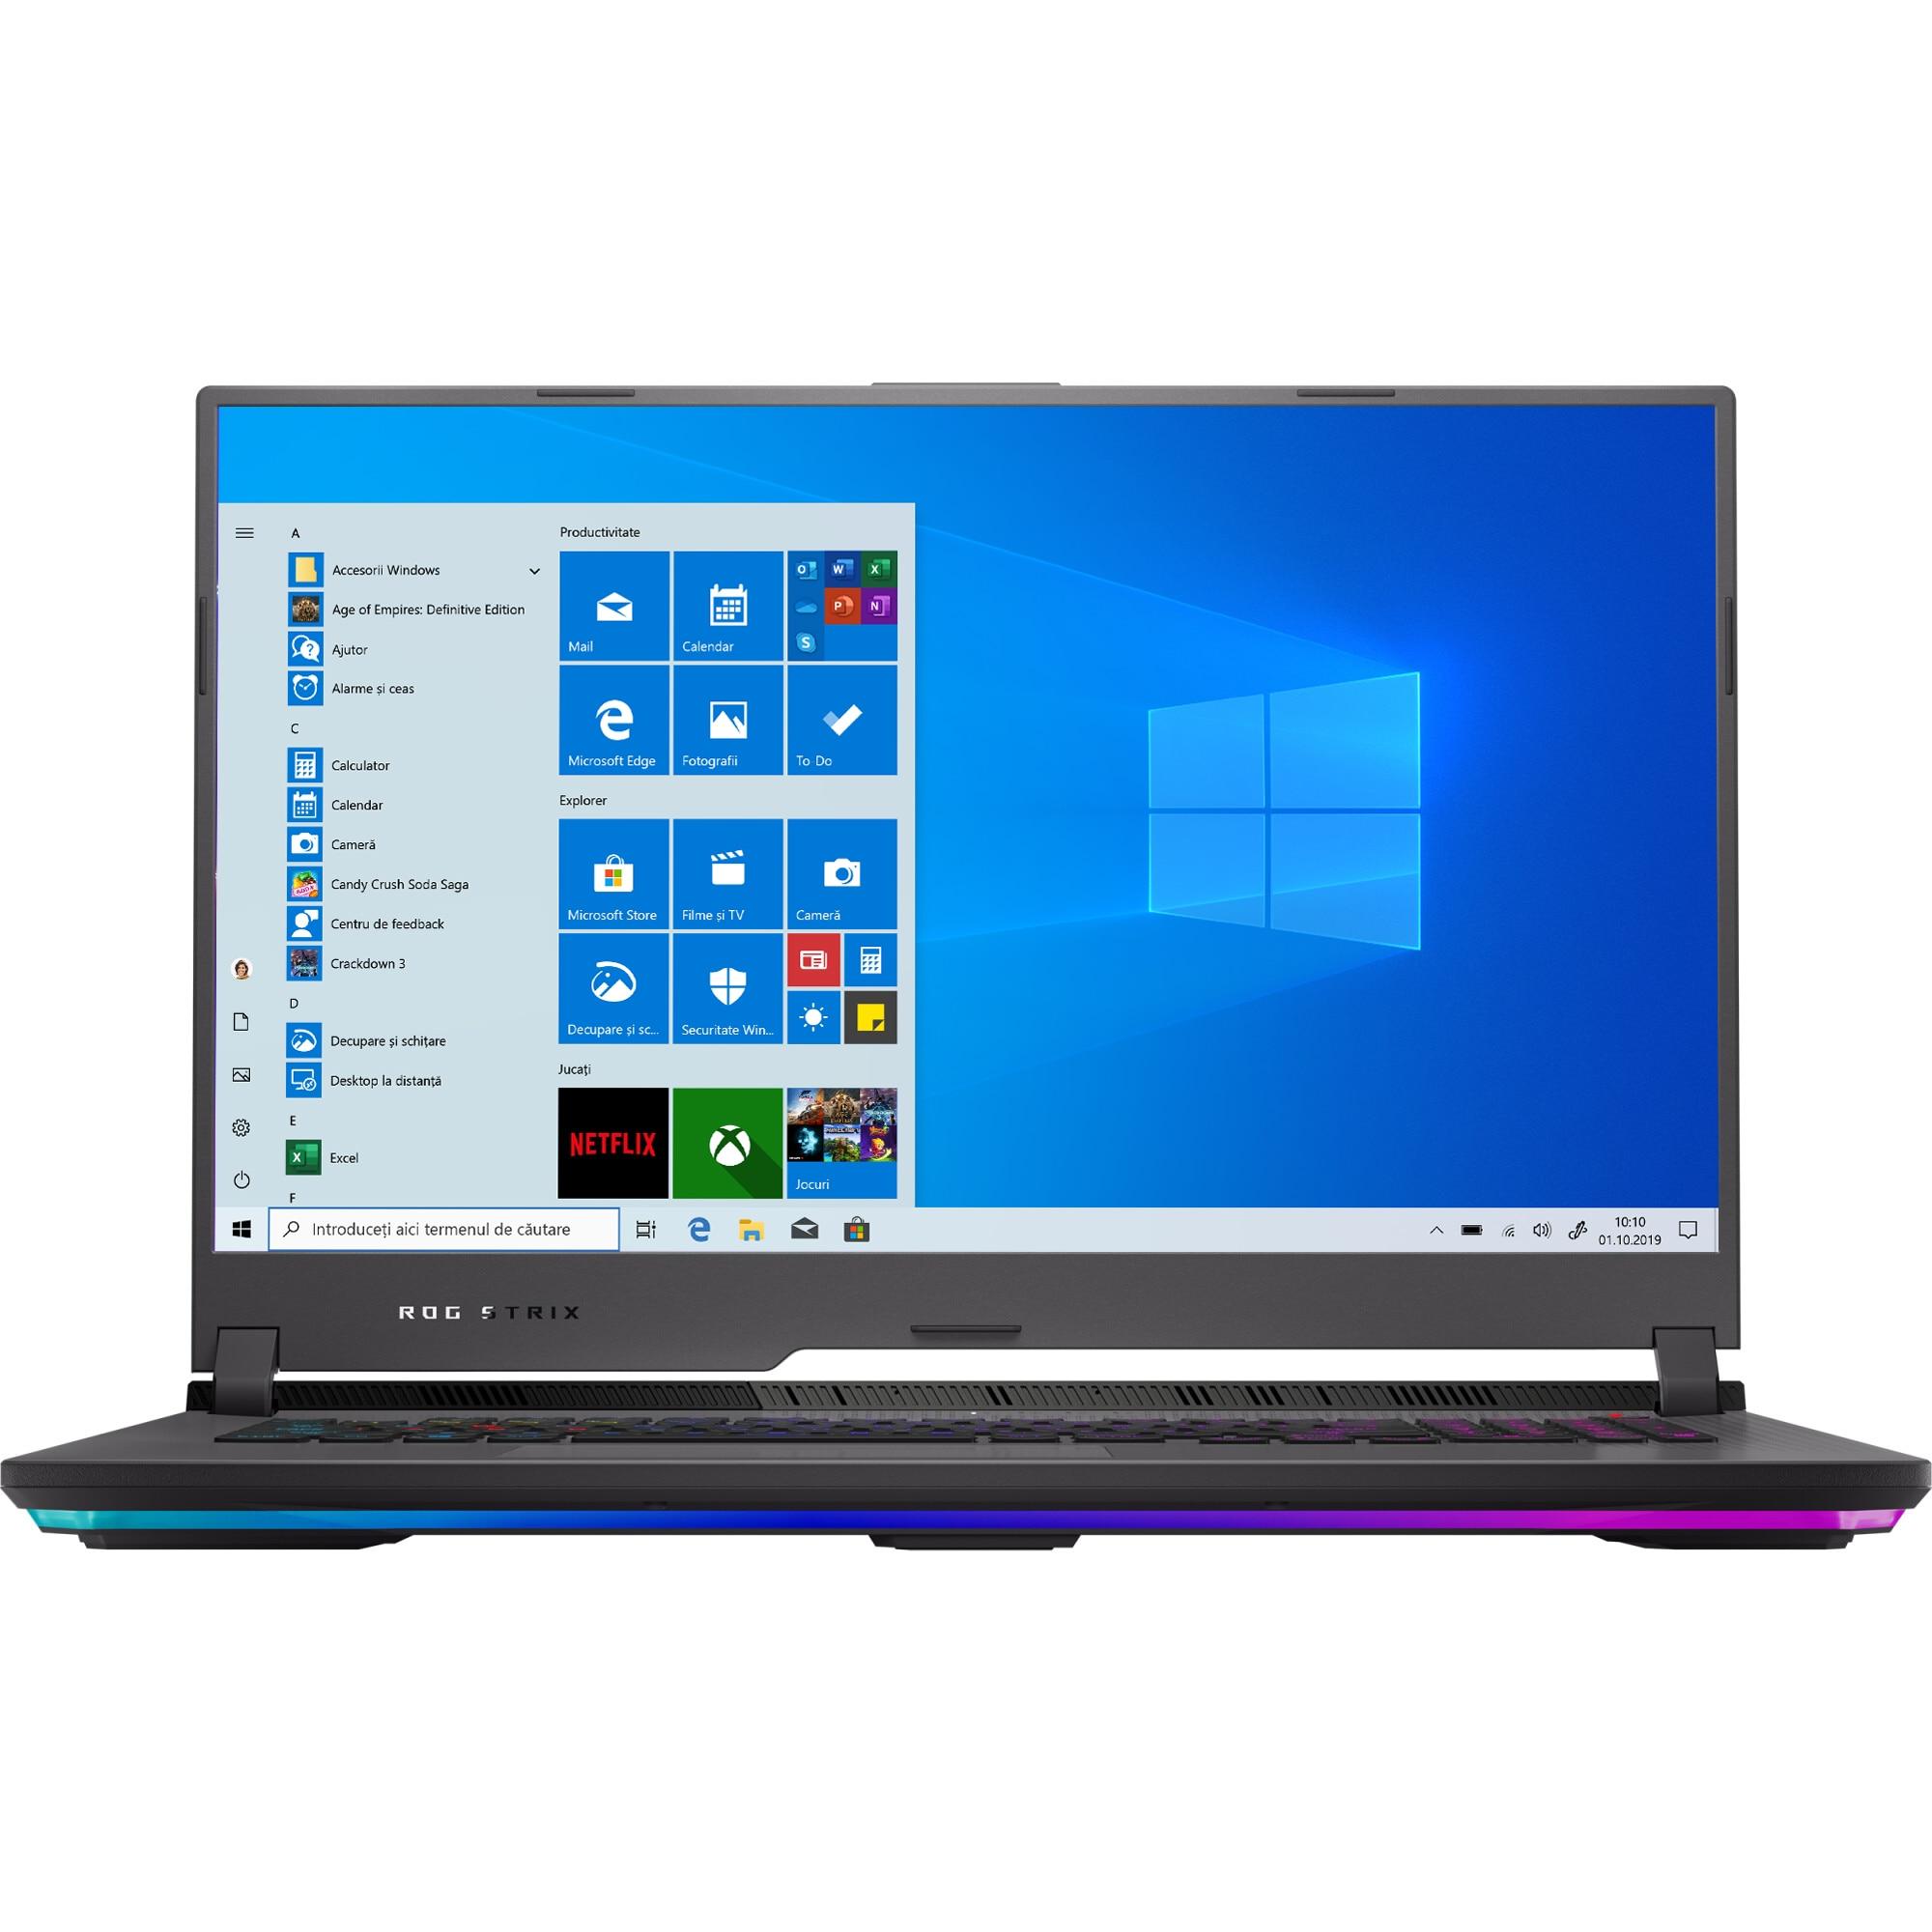 "Fotografie Laptop Gaming ASUSROG Strix G17 G713QR cu procesor AMD Ryzen™ 7 5800H pana la 4.40 GHz, 17.3"", Full HD, 300Hz, 16GB, 1TB SSD, NVIDIA® GeForce RTX™ 3070 8GB, Windows 10 Home, Eclipse Gray"